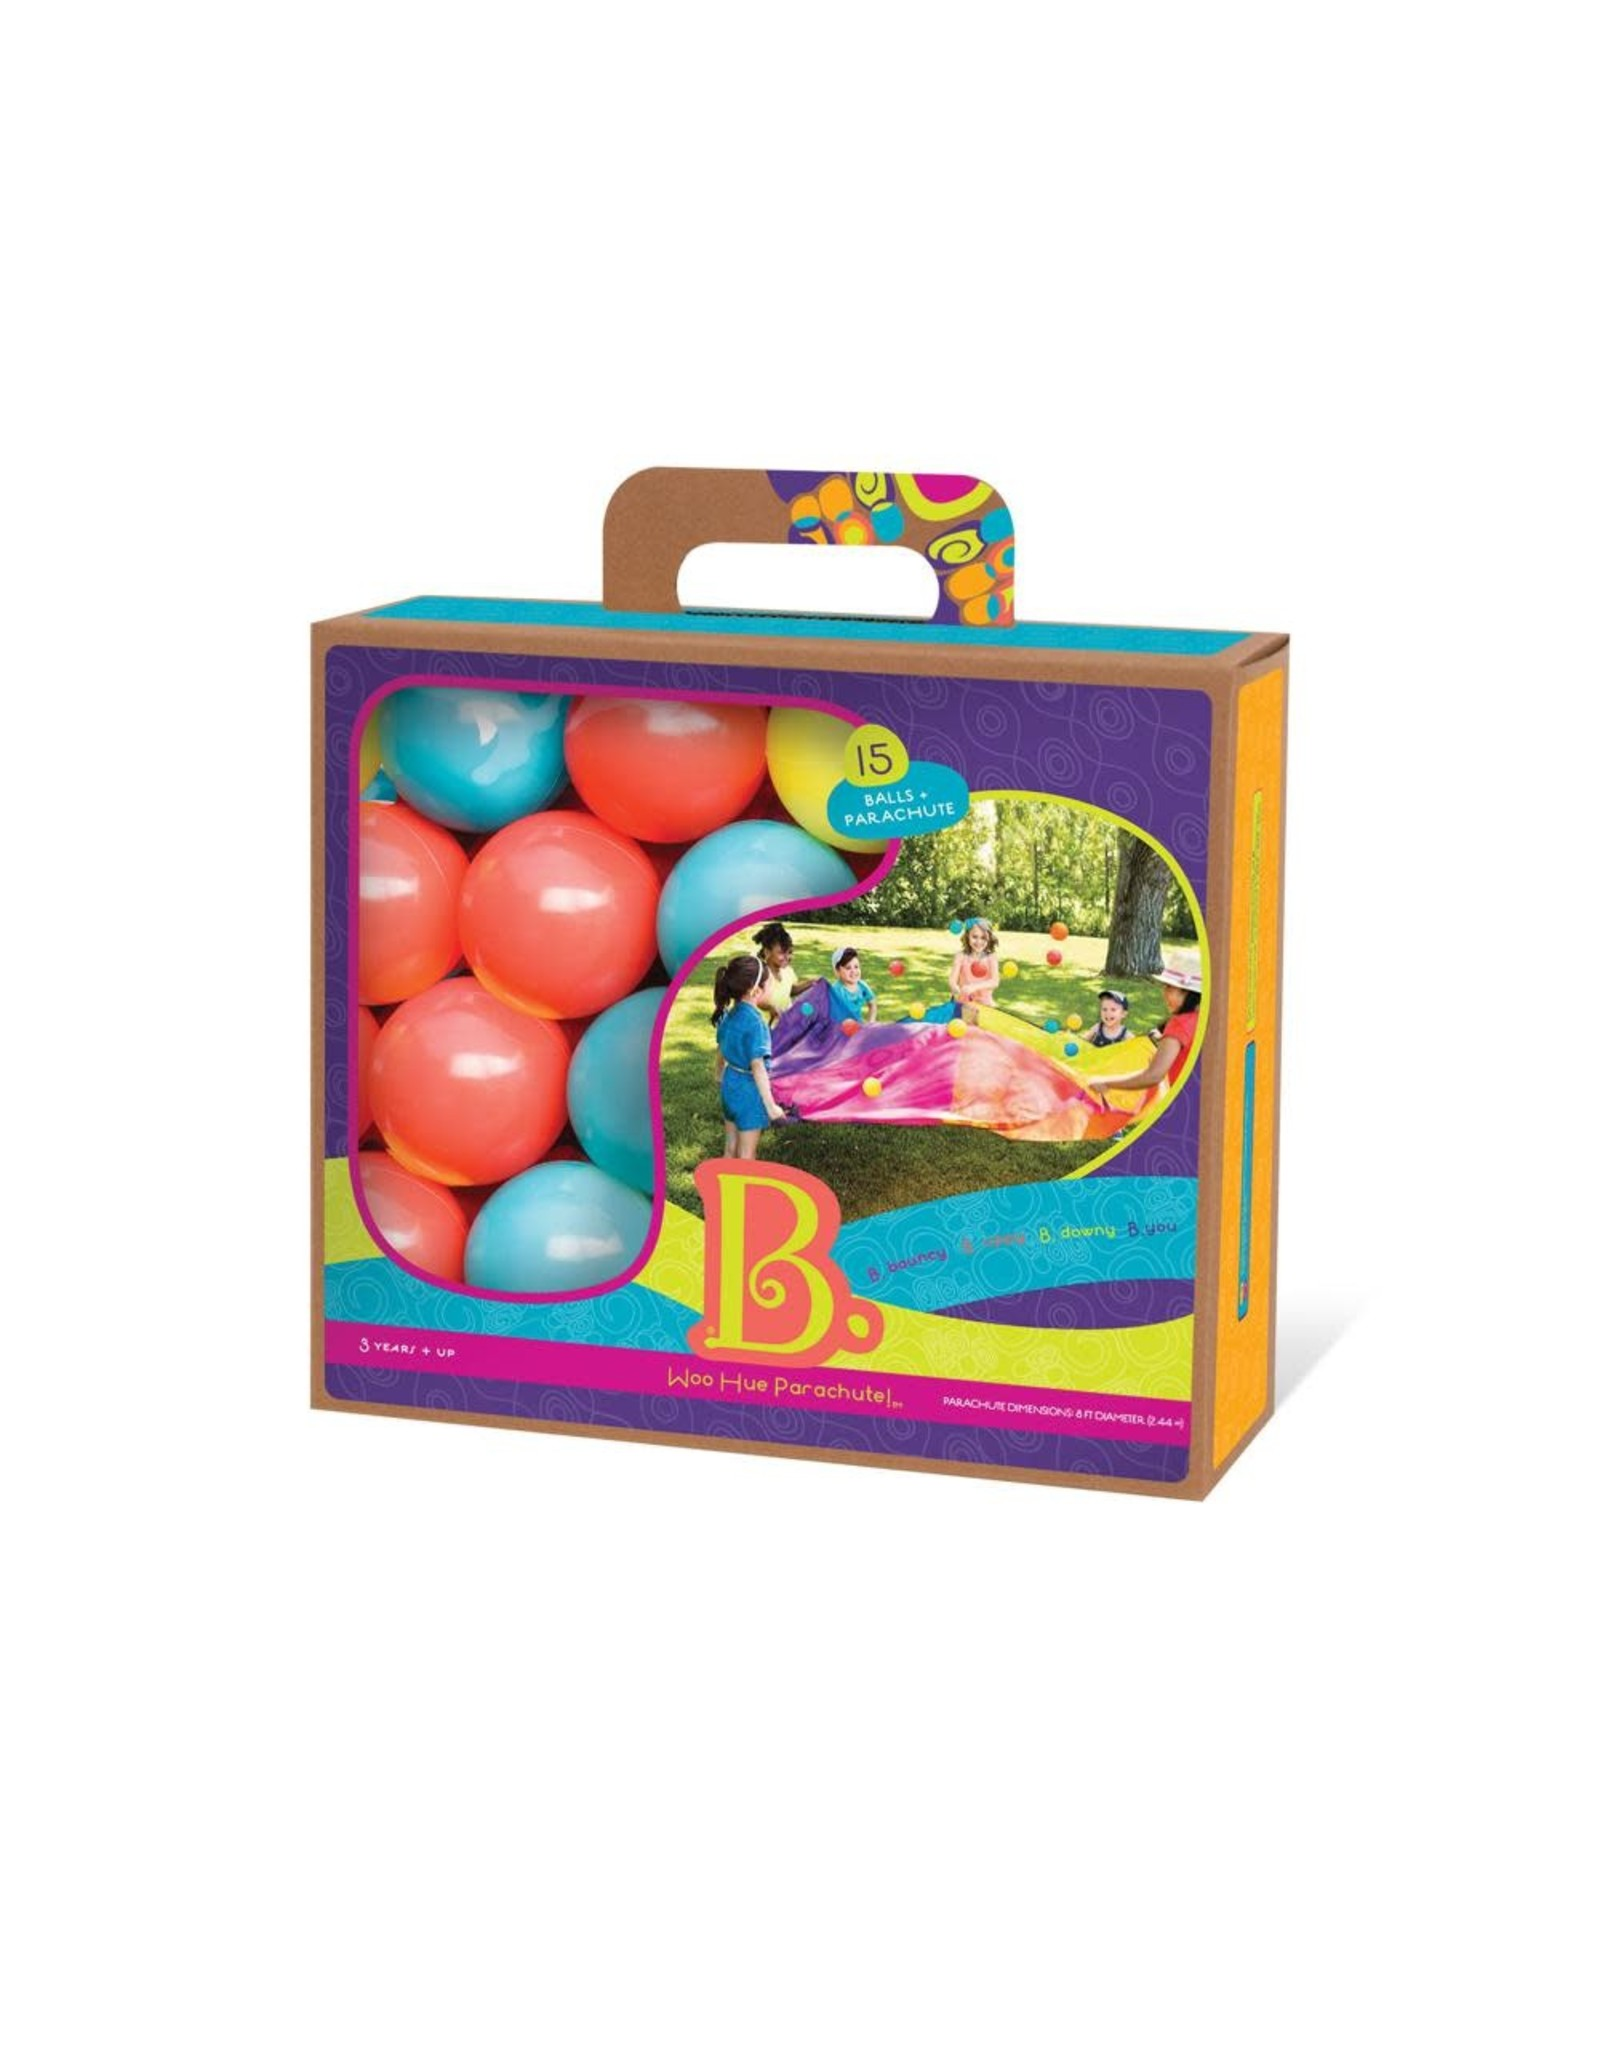 B. B. Woo Hue Parachute & 15 Balls